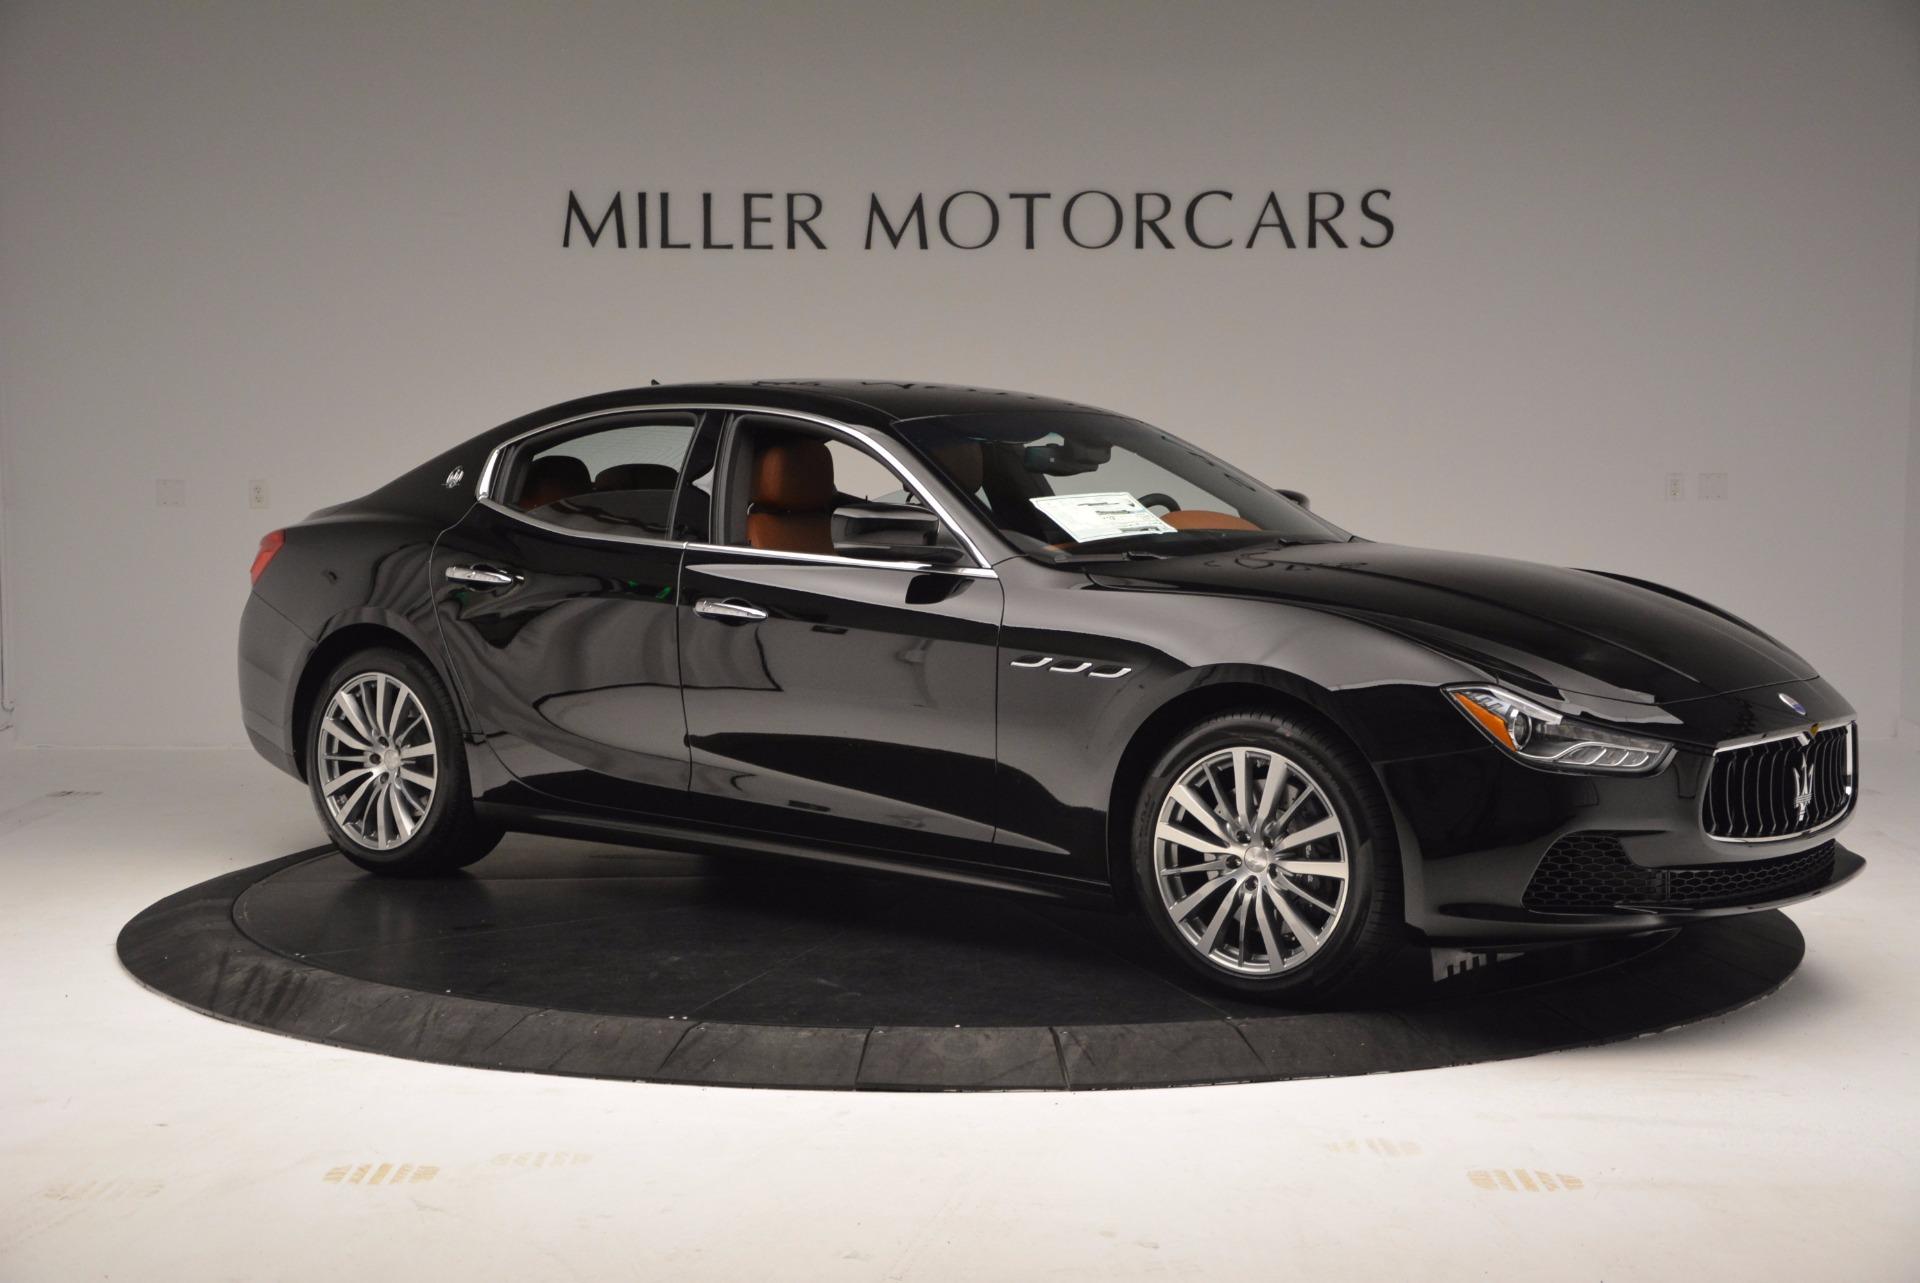 New 2017 Maserati Ghibli S Q4 EX-LOANER For Sale In Greenwich, CT. Alfa Romeo of Greenwich, M1859 1115_p10